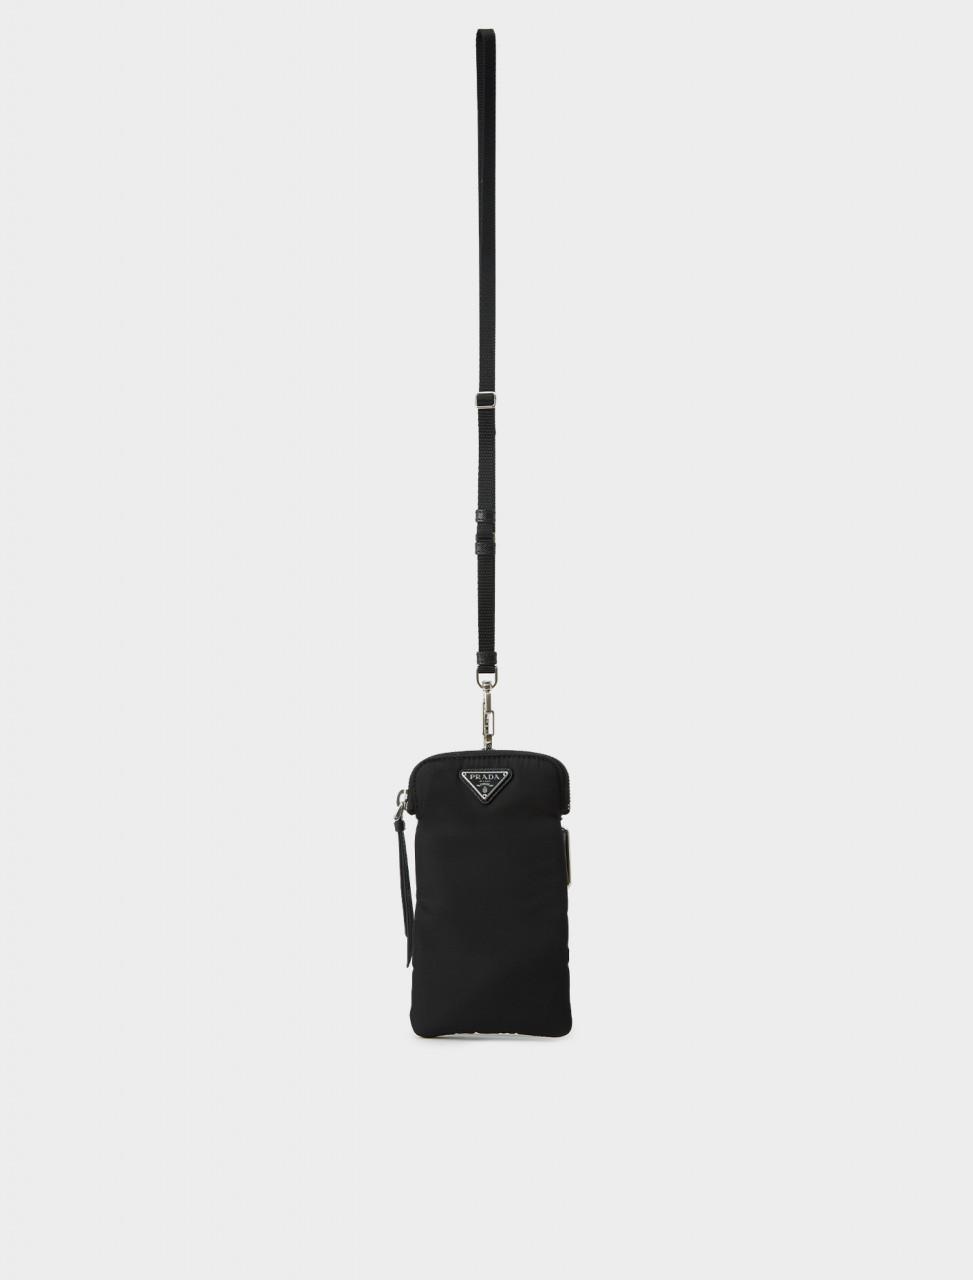 Prada Black Nylon Phone Case with Strap